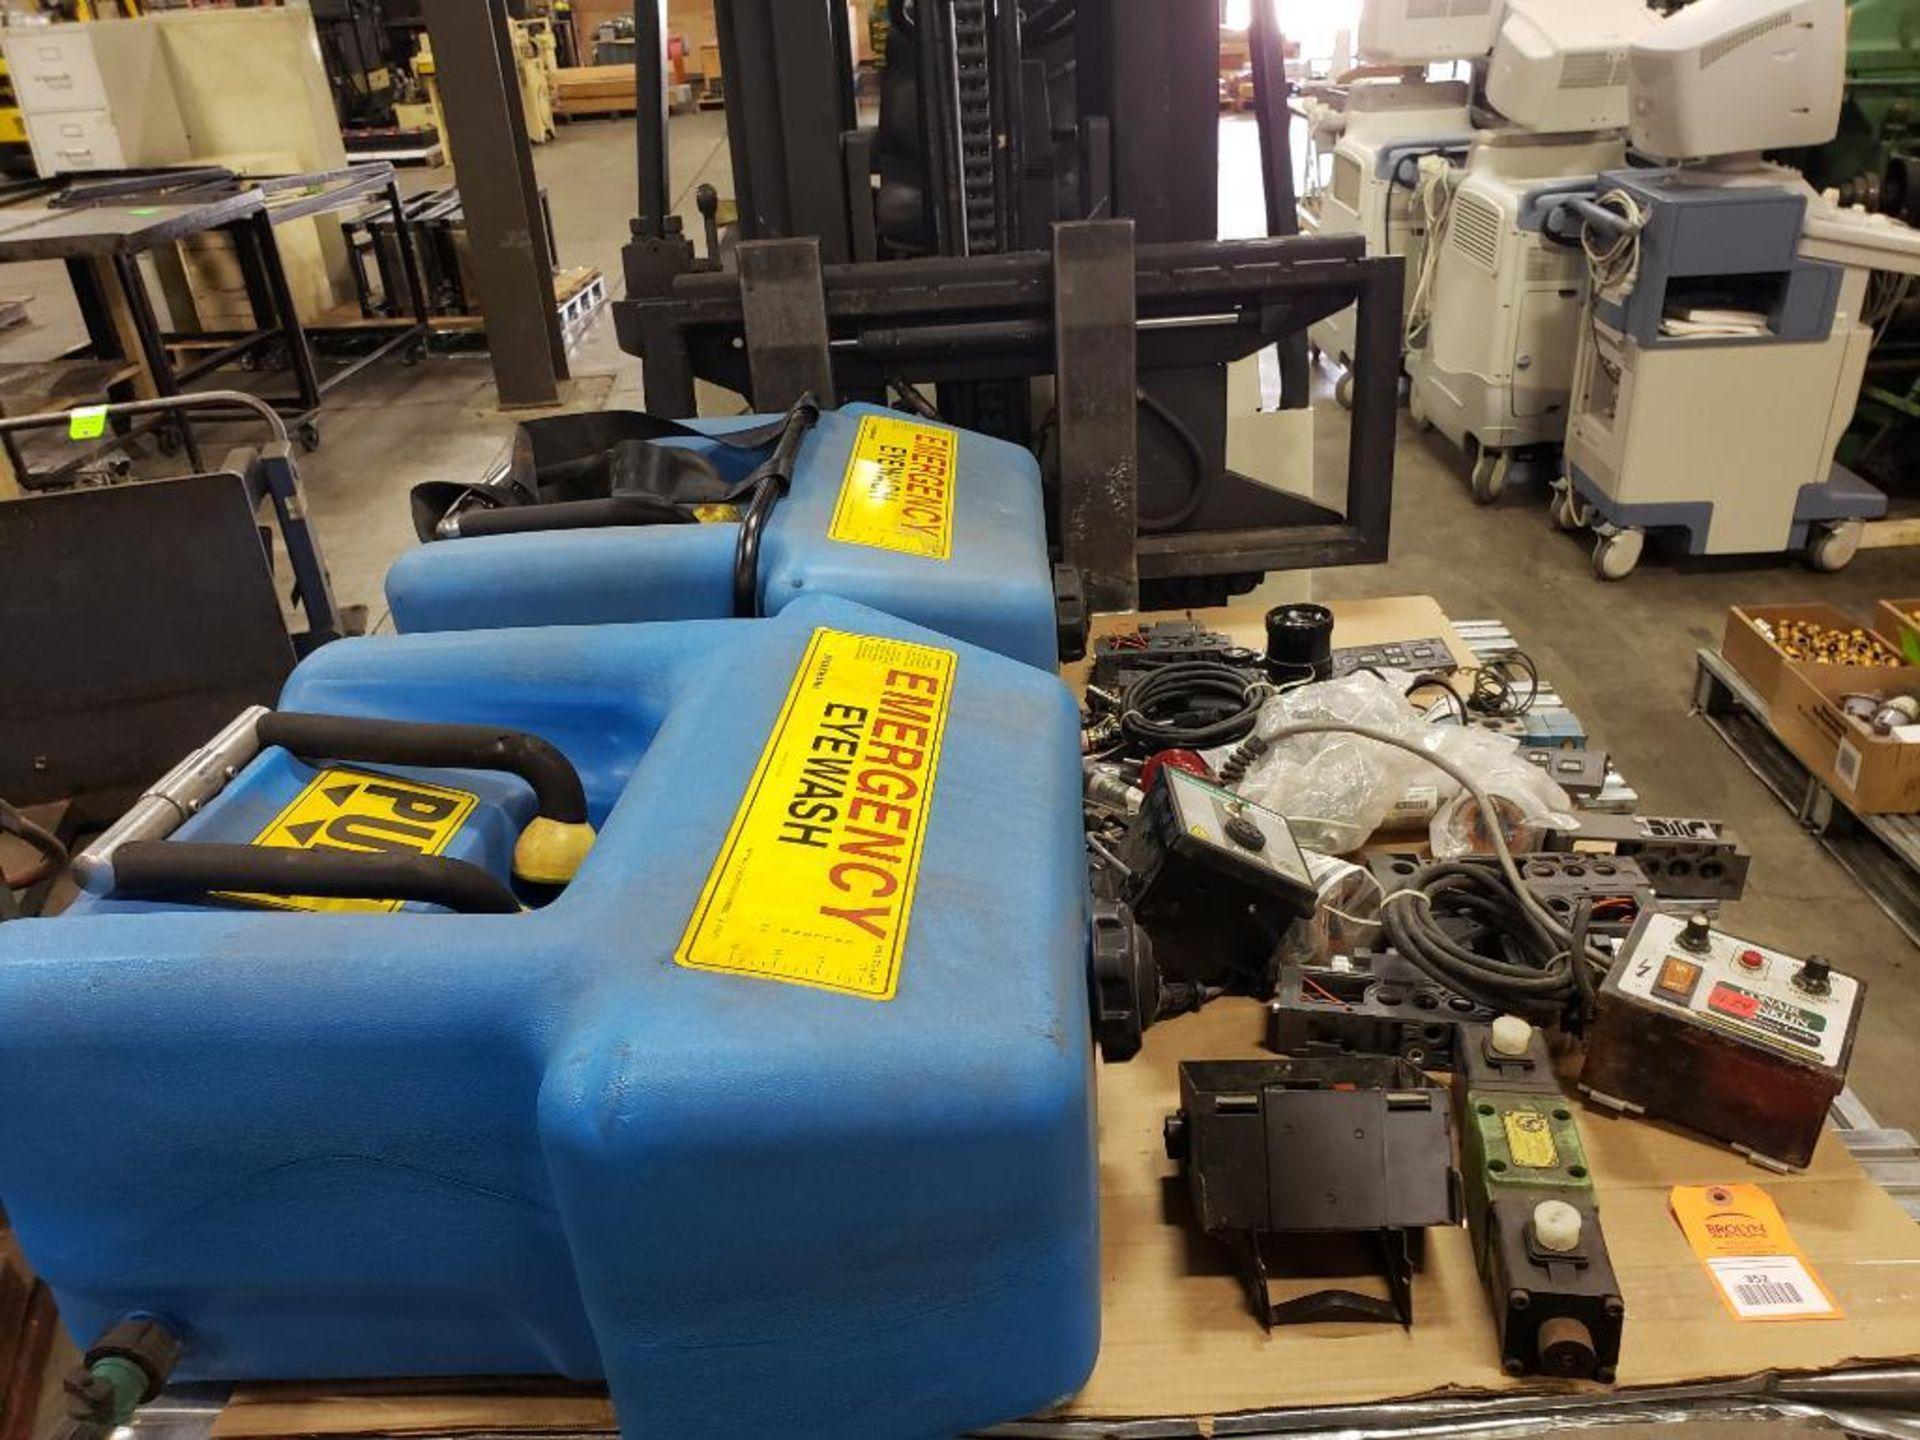 Pallet of assorted parts. Emergency eyewash, Conair universal terminal box, Hydraulik Ring valve.